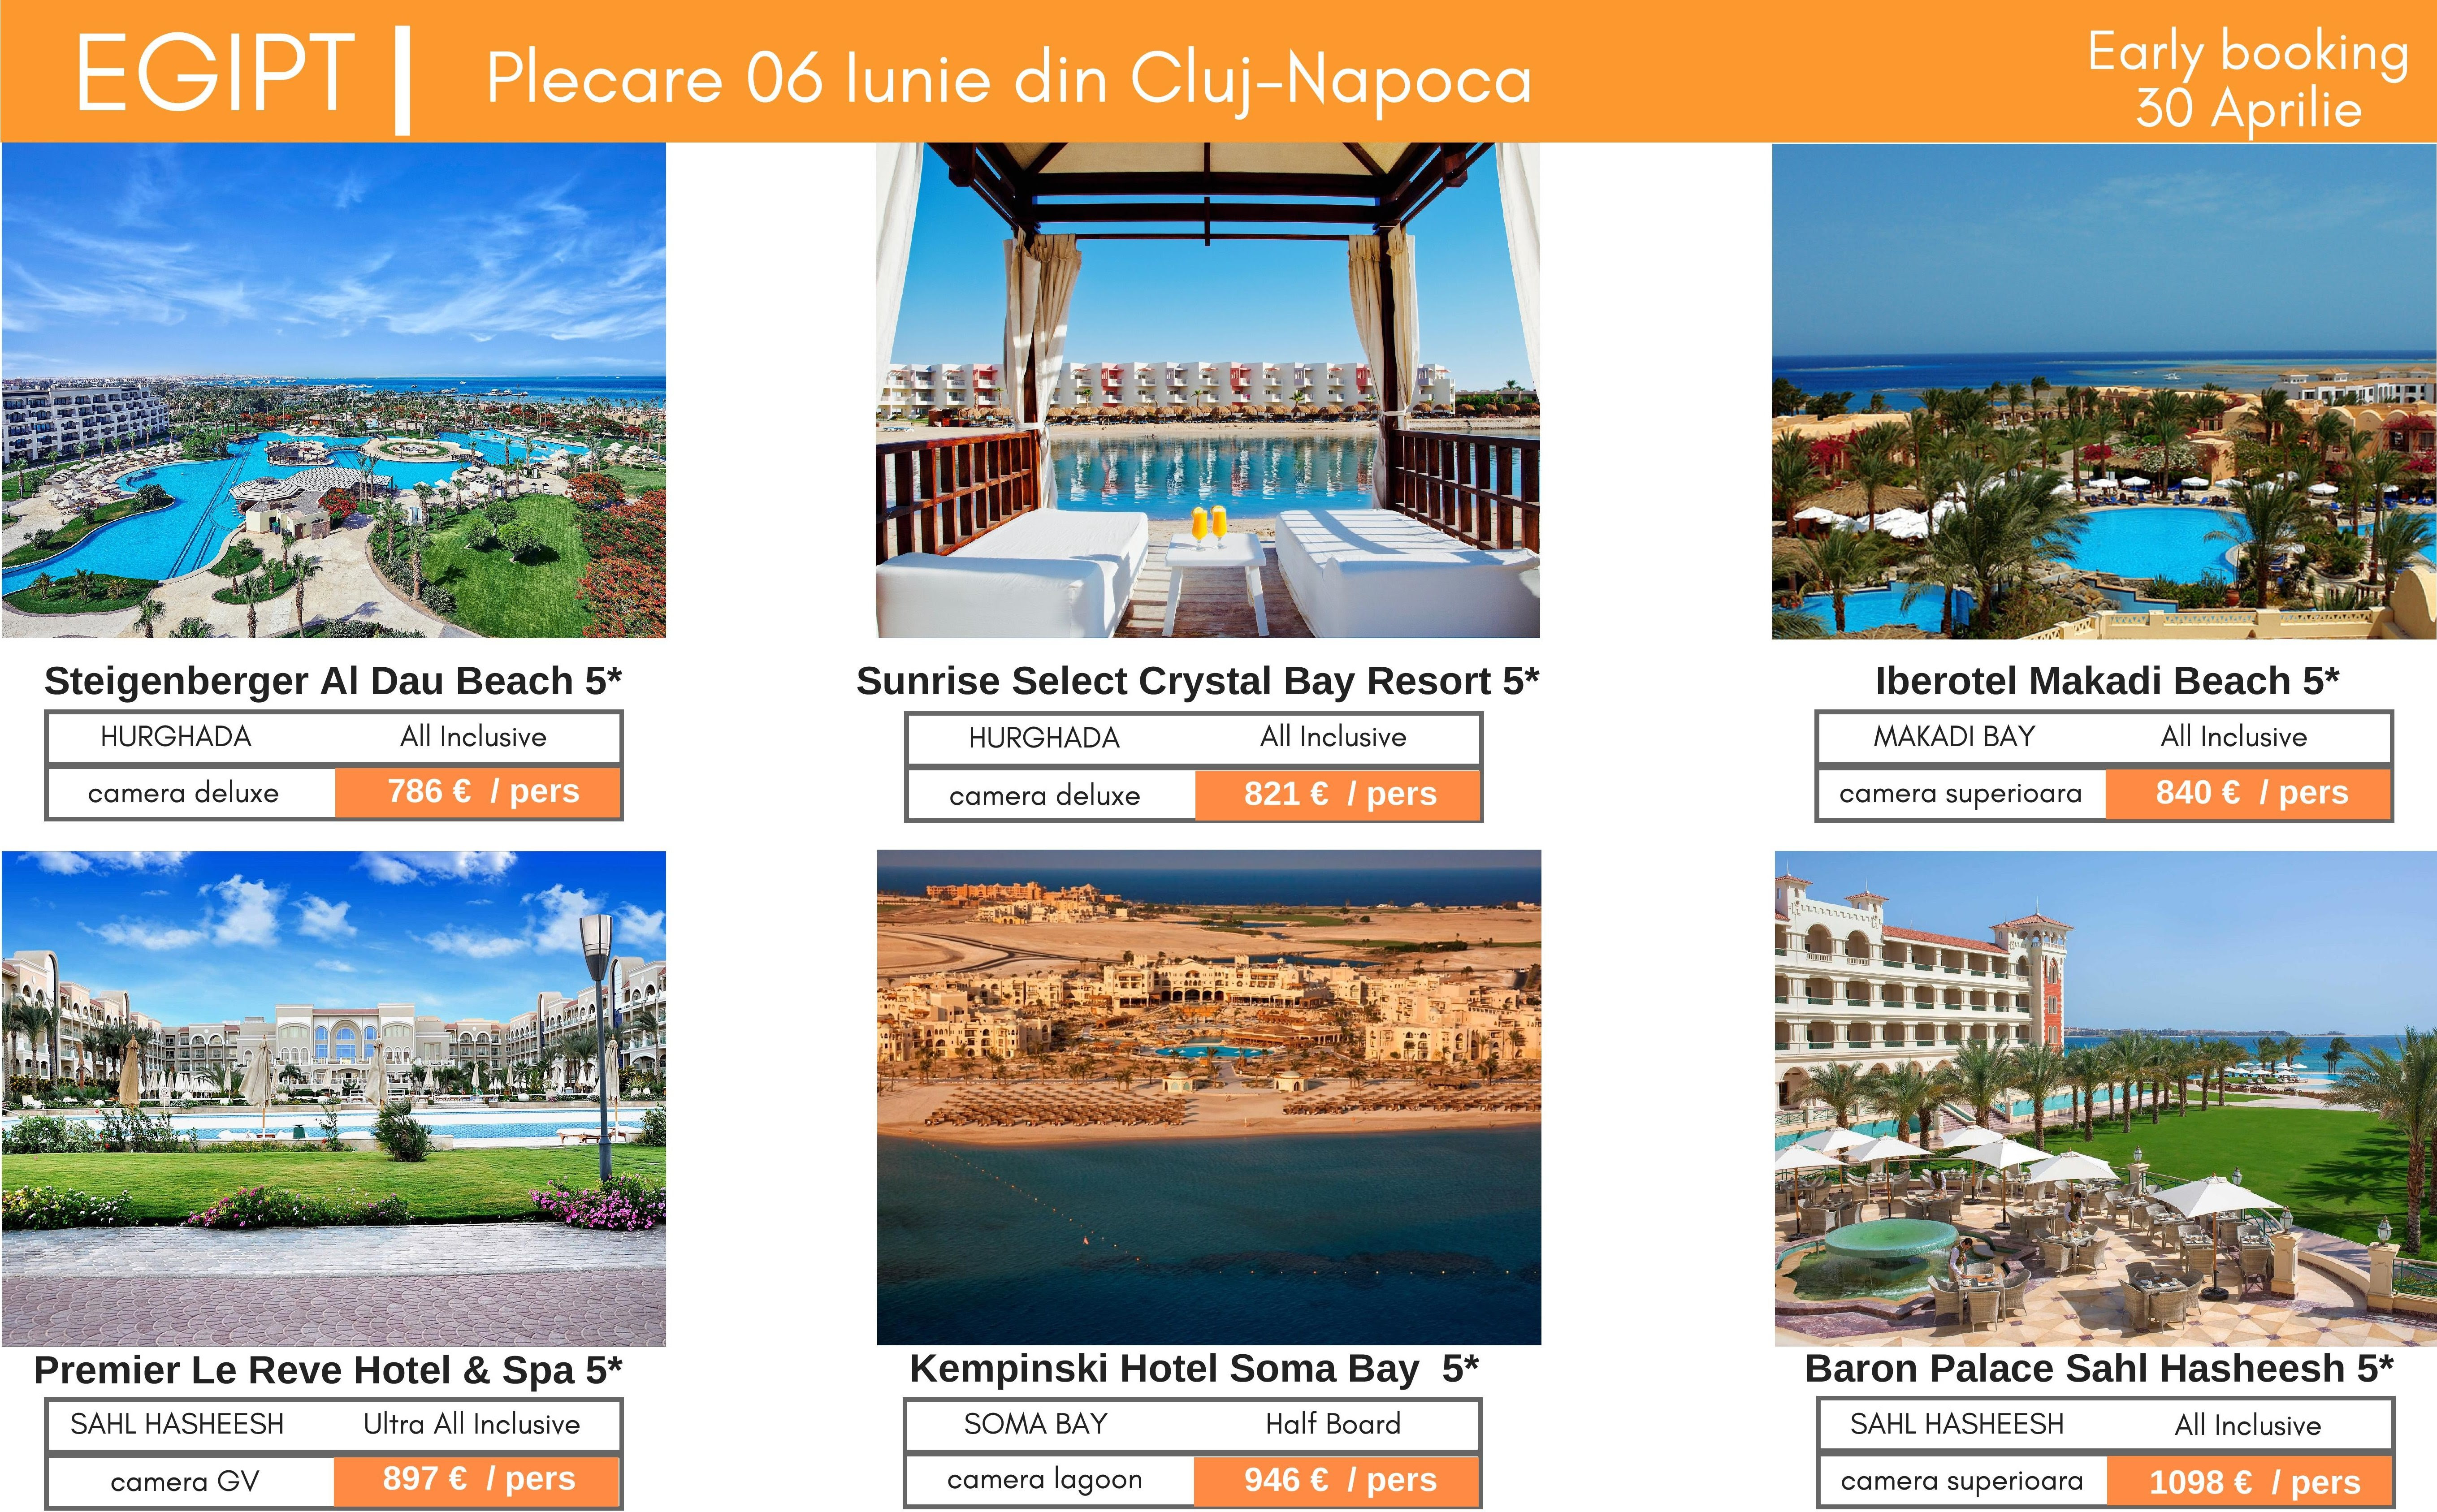 Egipt-Hurghada | Hoteluri 5* Deluxe | Plecare 06 Iunie din Cluj-Napoca